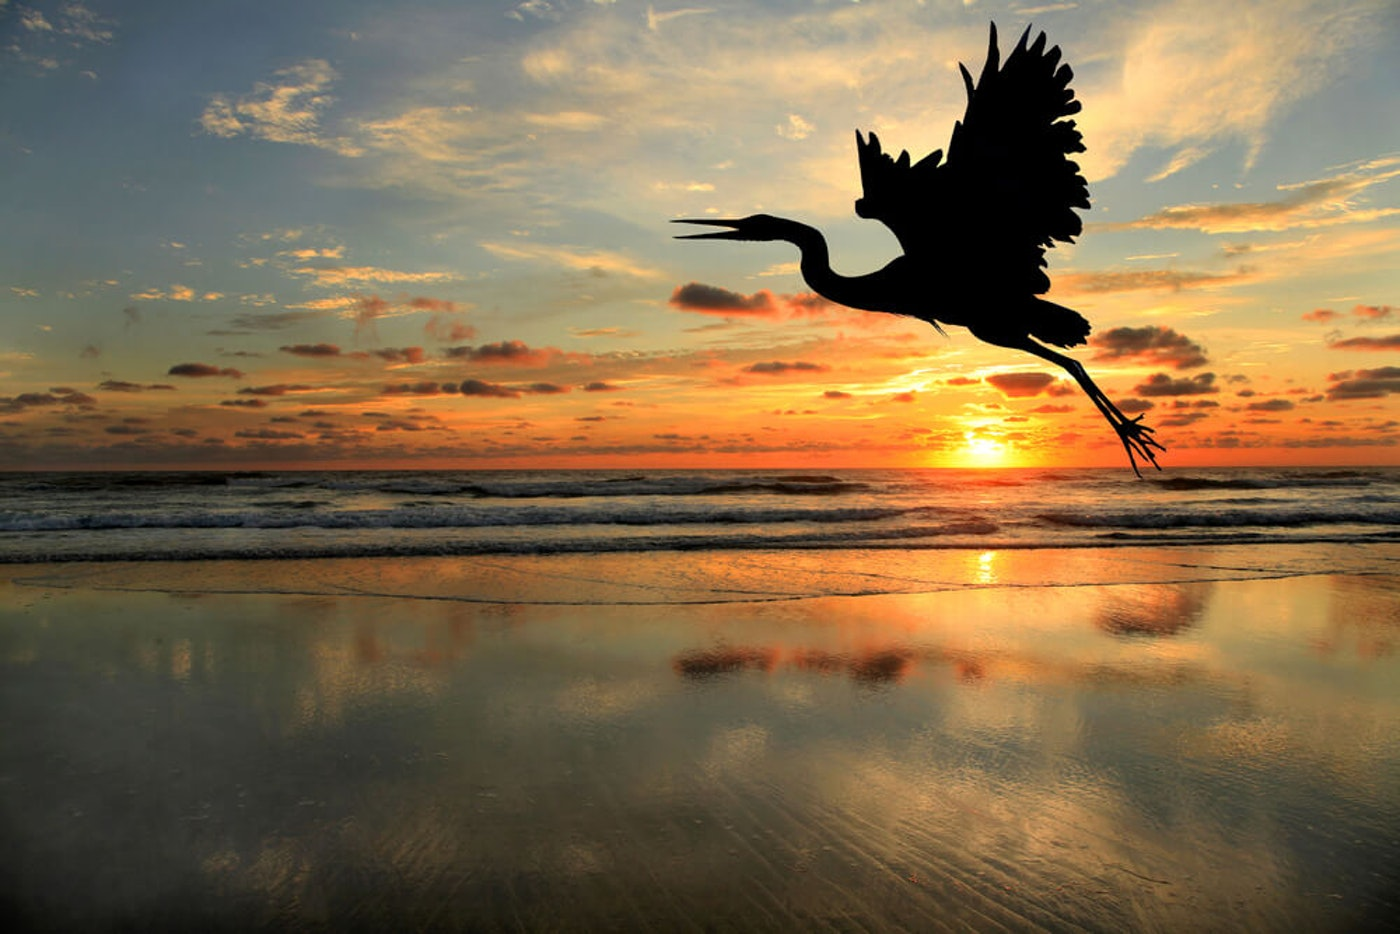 The blue heron takes flight at sunset in North Carolina. (Image via Shutterstock)